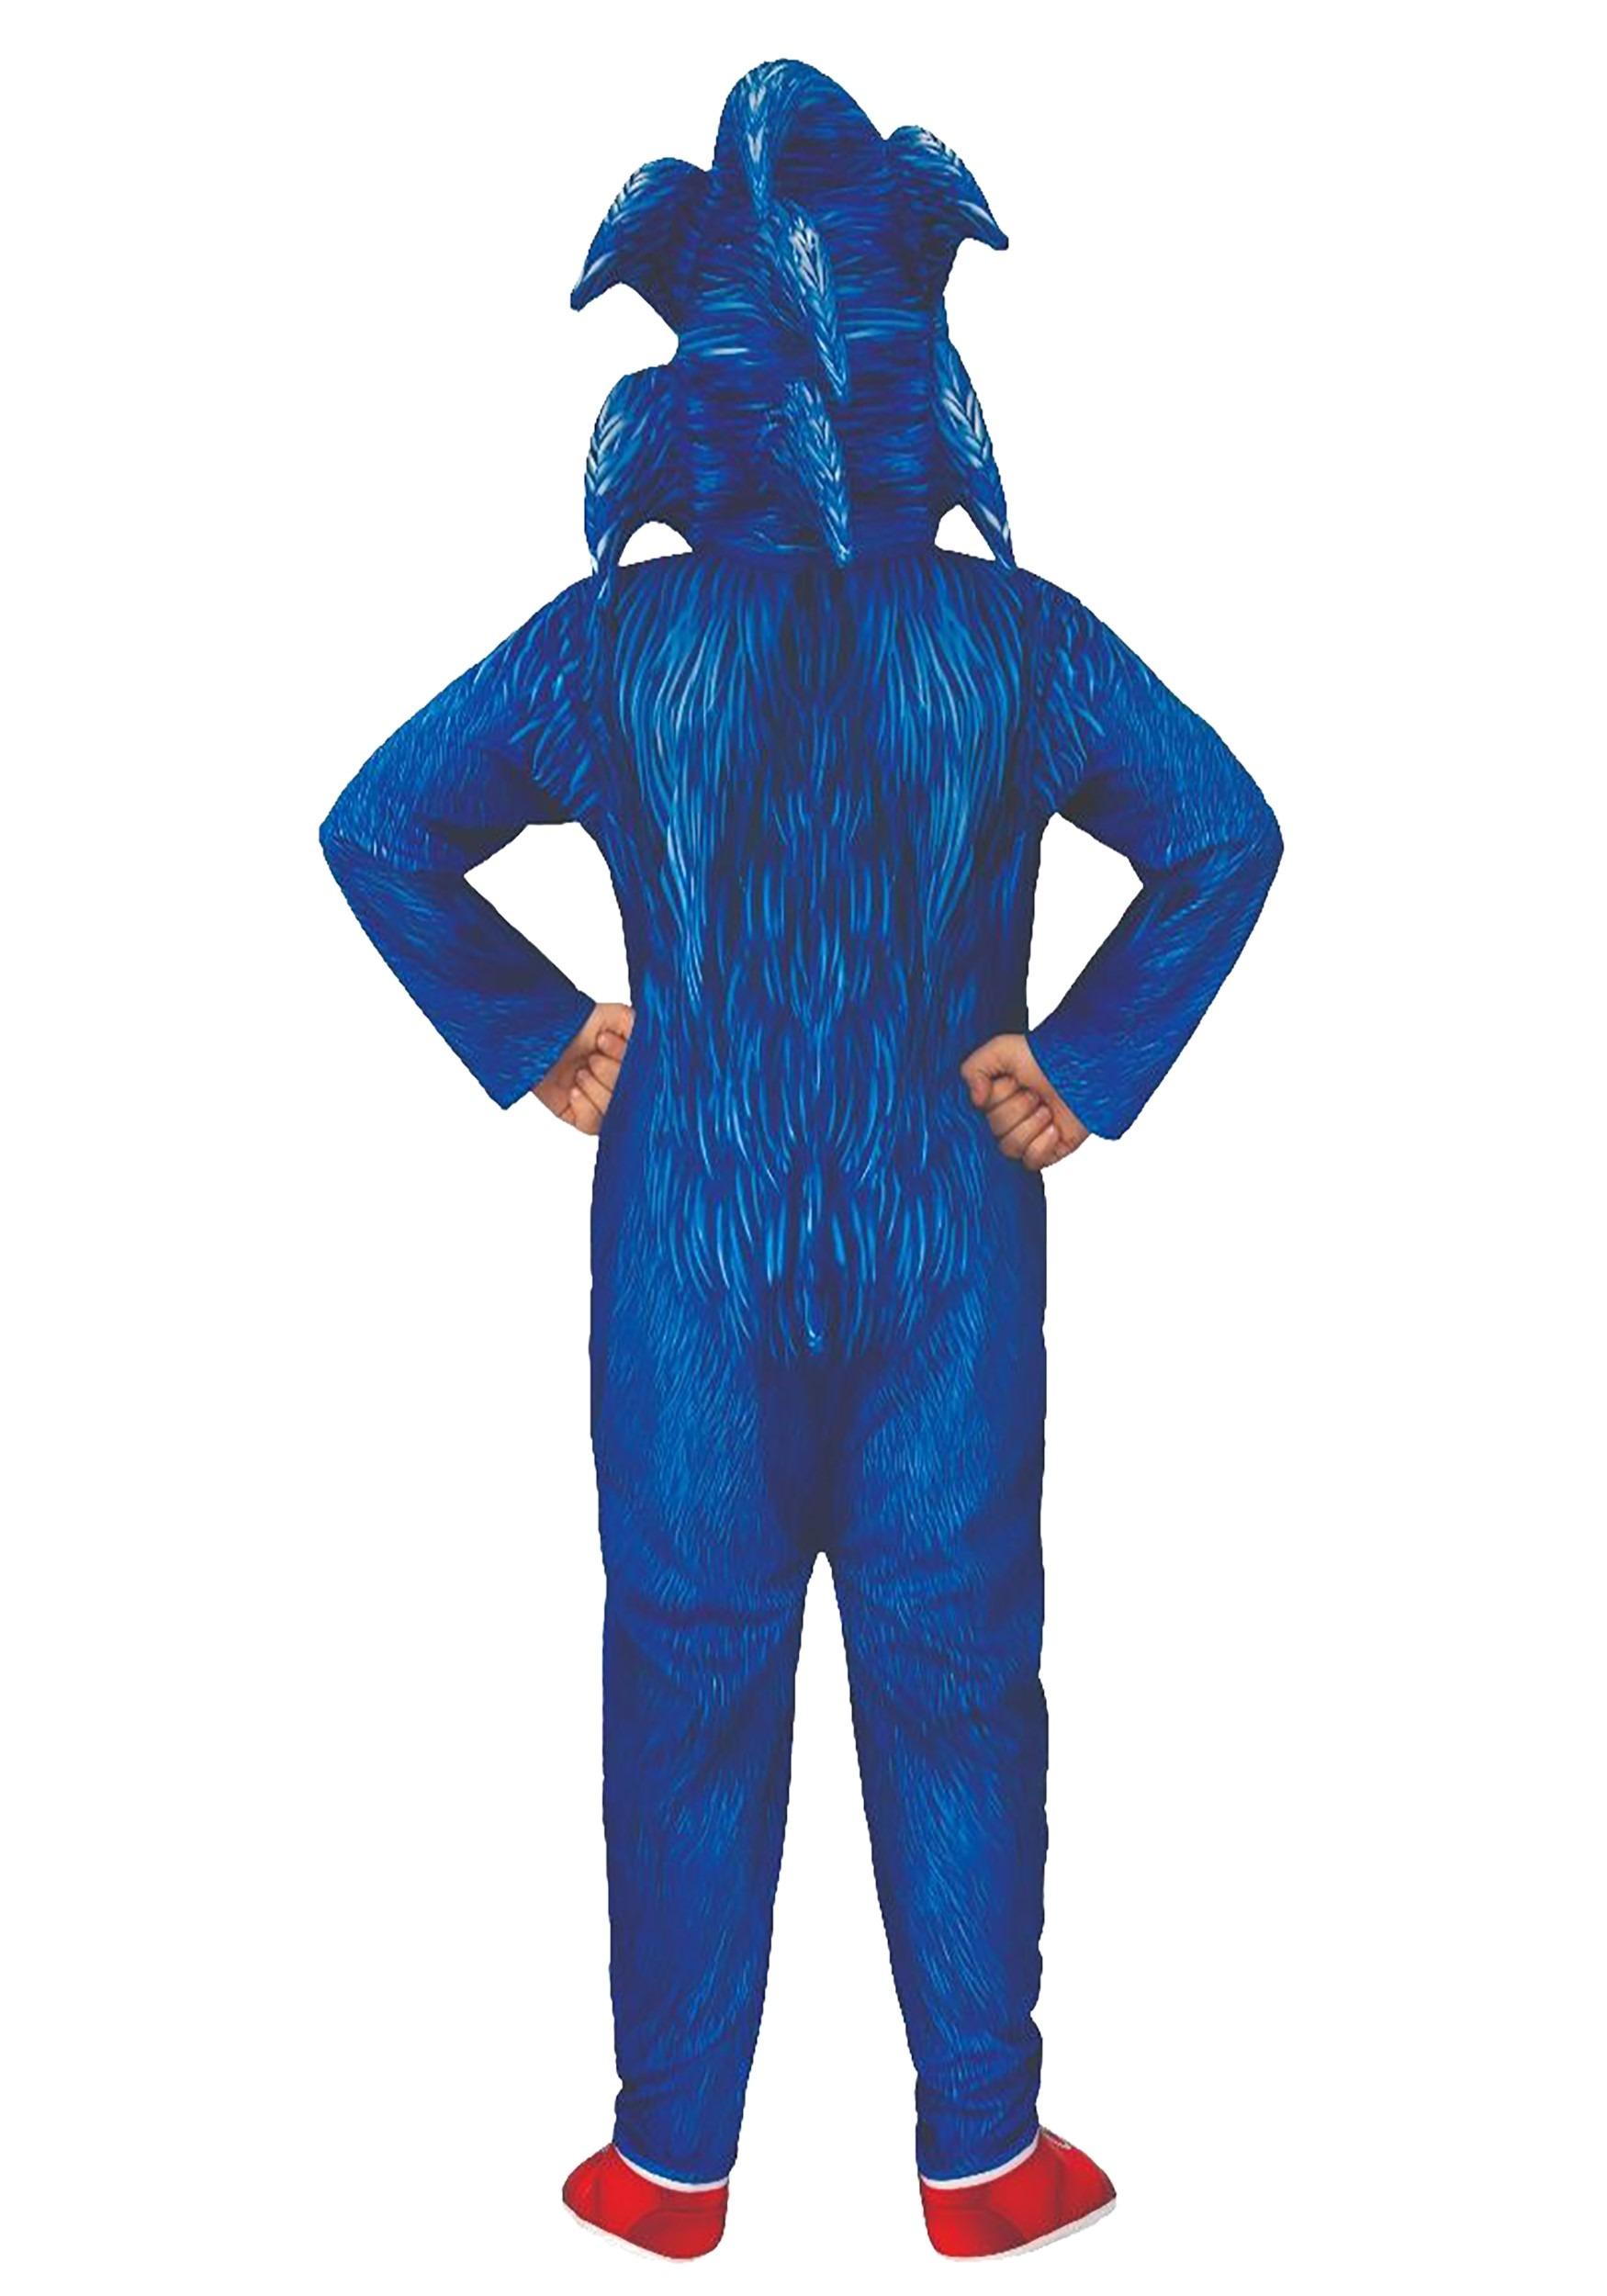 Sonic The Hedgehog Movie Deluxe Costume